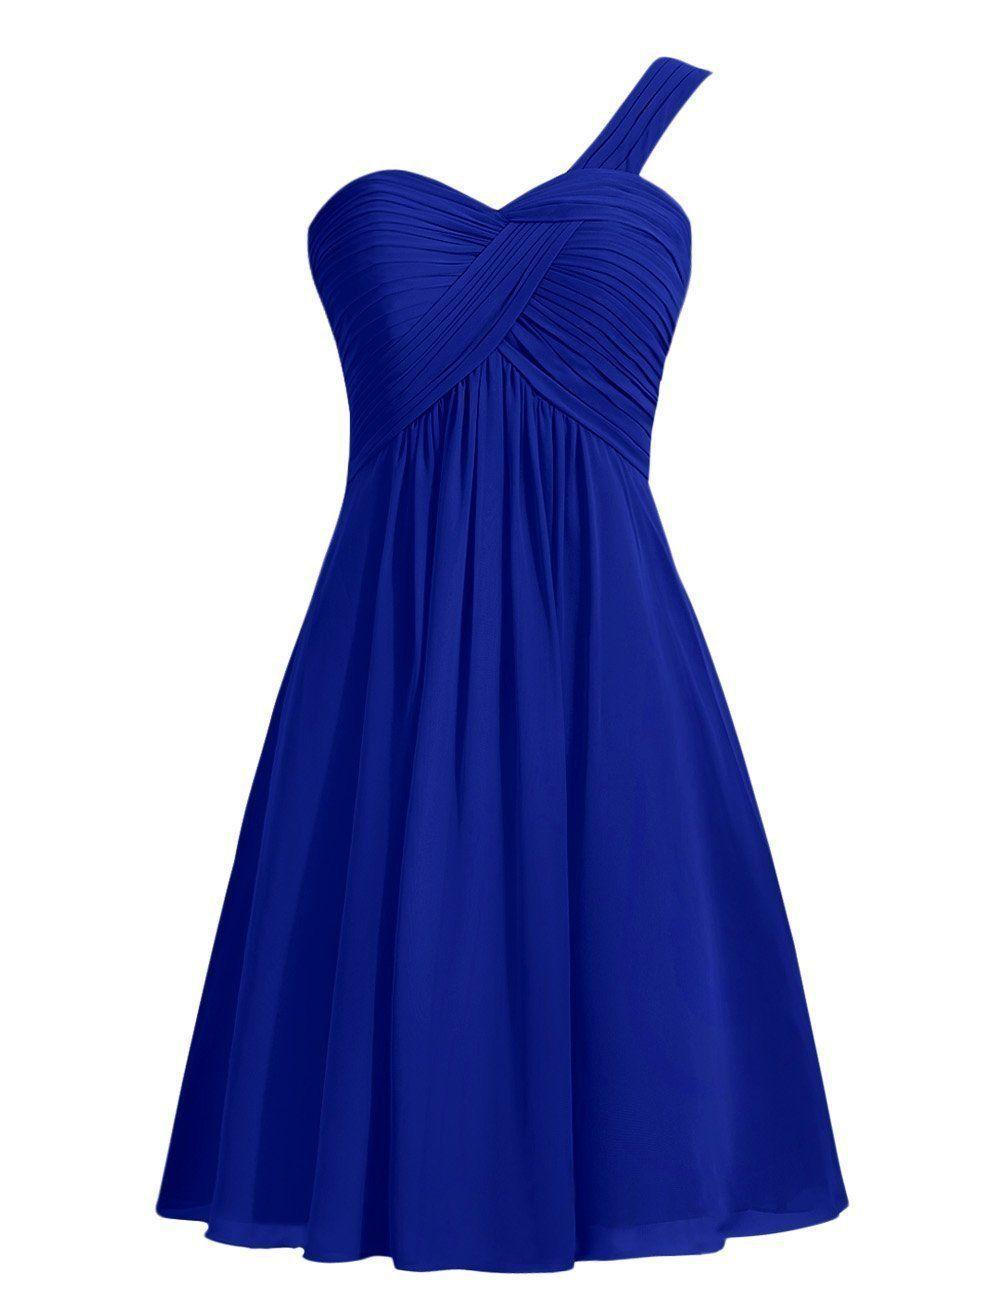 One Shooulder Short Bridesmaid Dress A Line Chiffon Cheap Mint Cocktail Dress 2018 Wholesale Women Wedding Party Gown